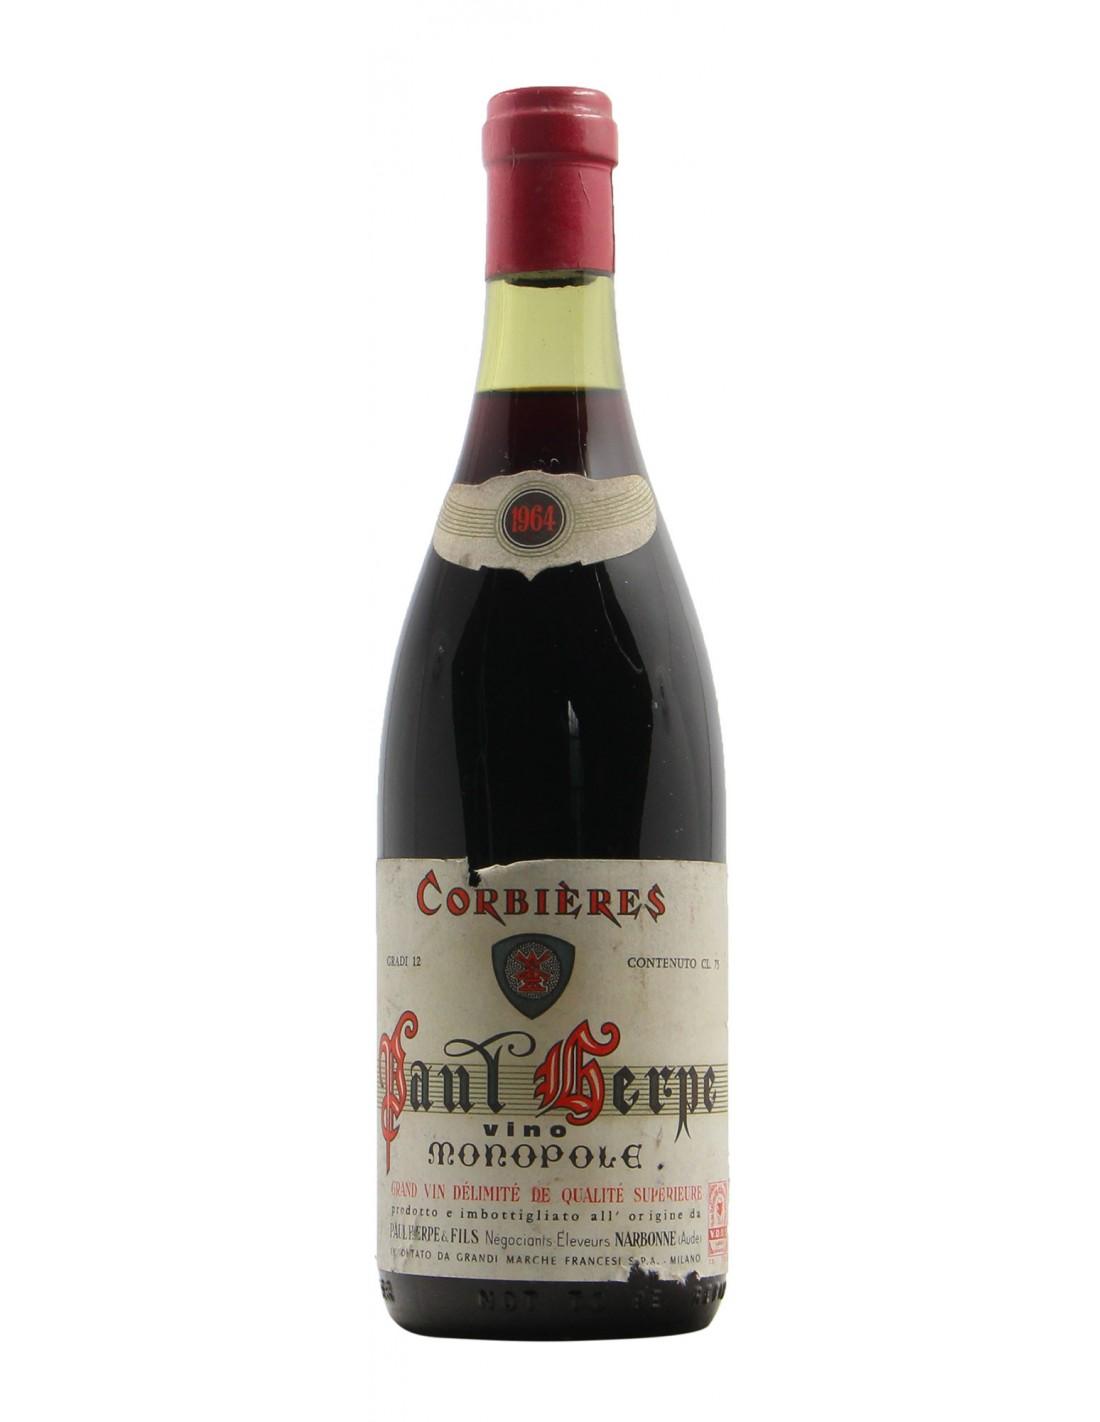 CORBIERES 1964 HERPE & FILS Grandi Bottiglie